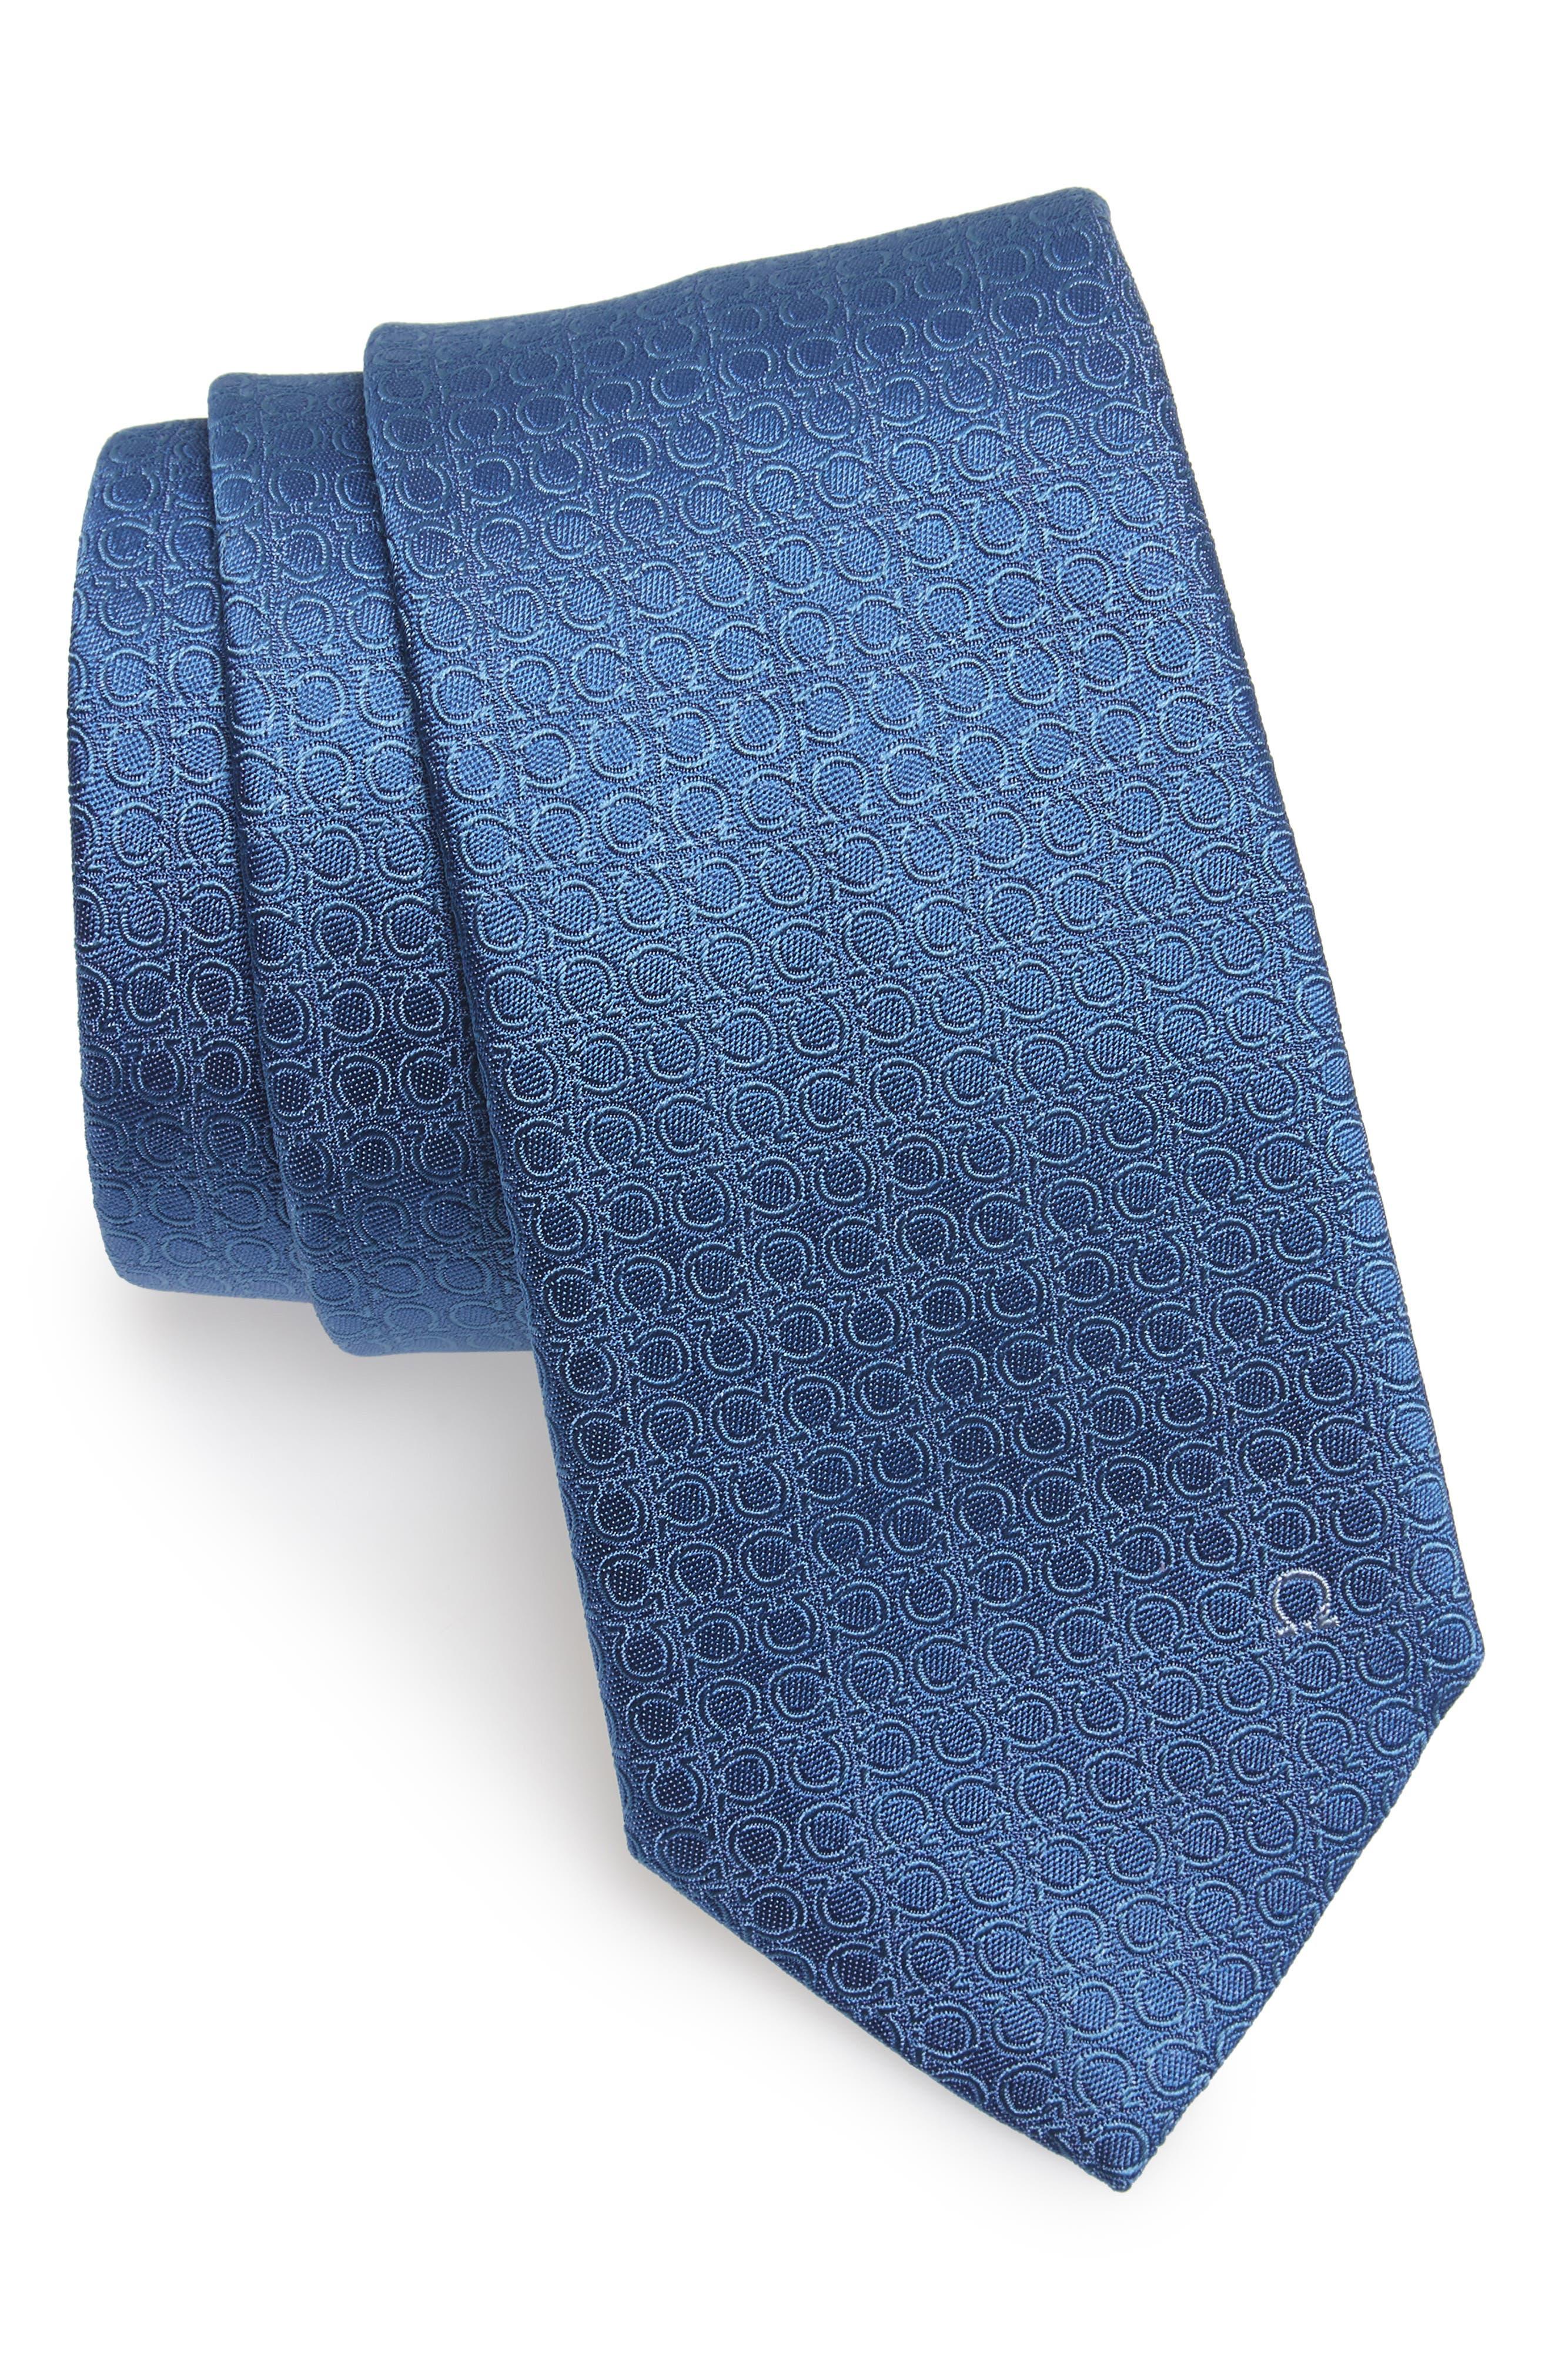 Salvatore Ferragamo Erve Gancini Silk Tie